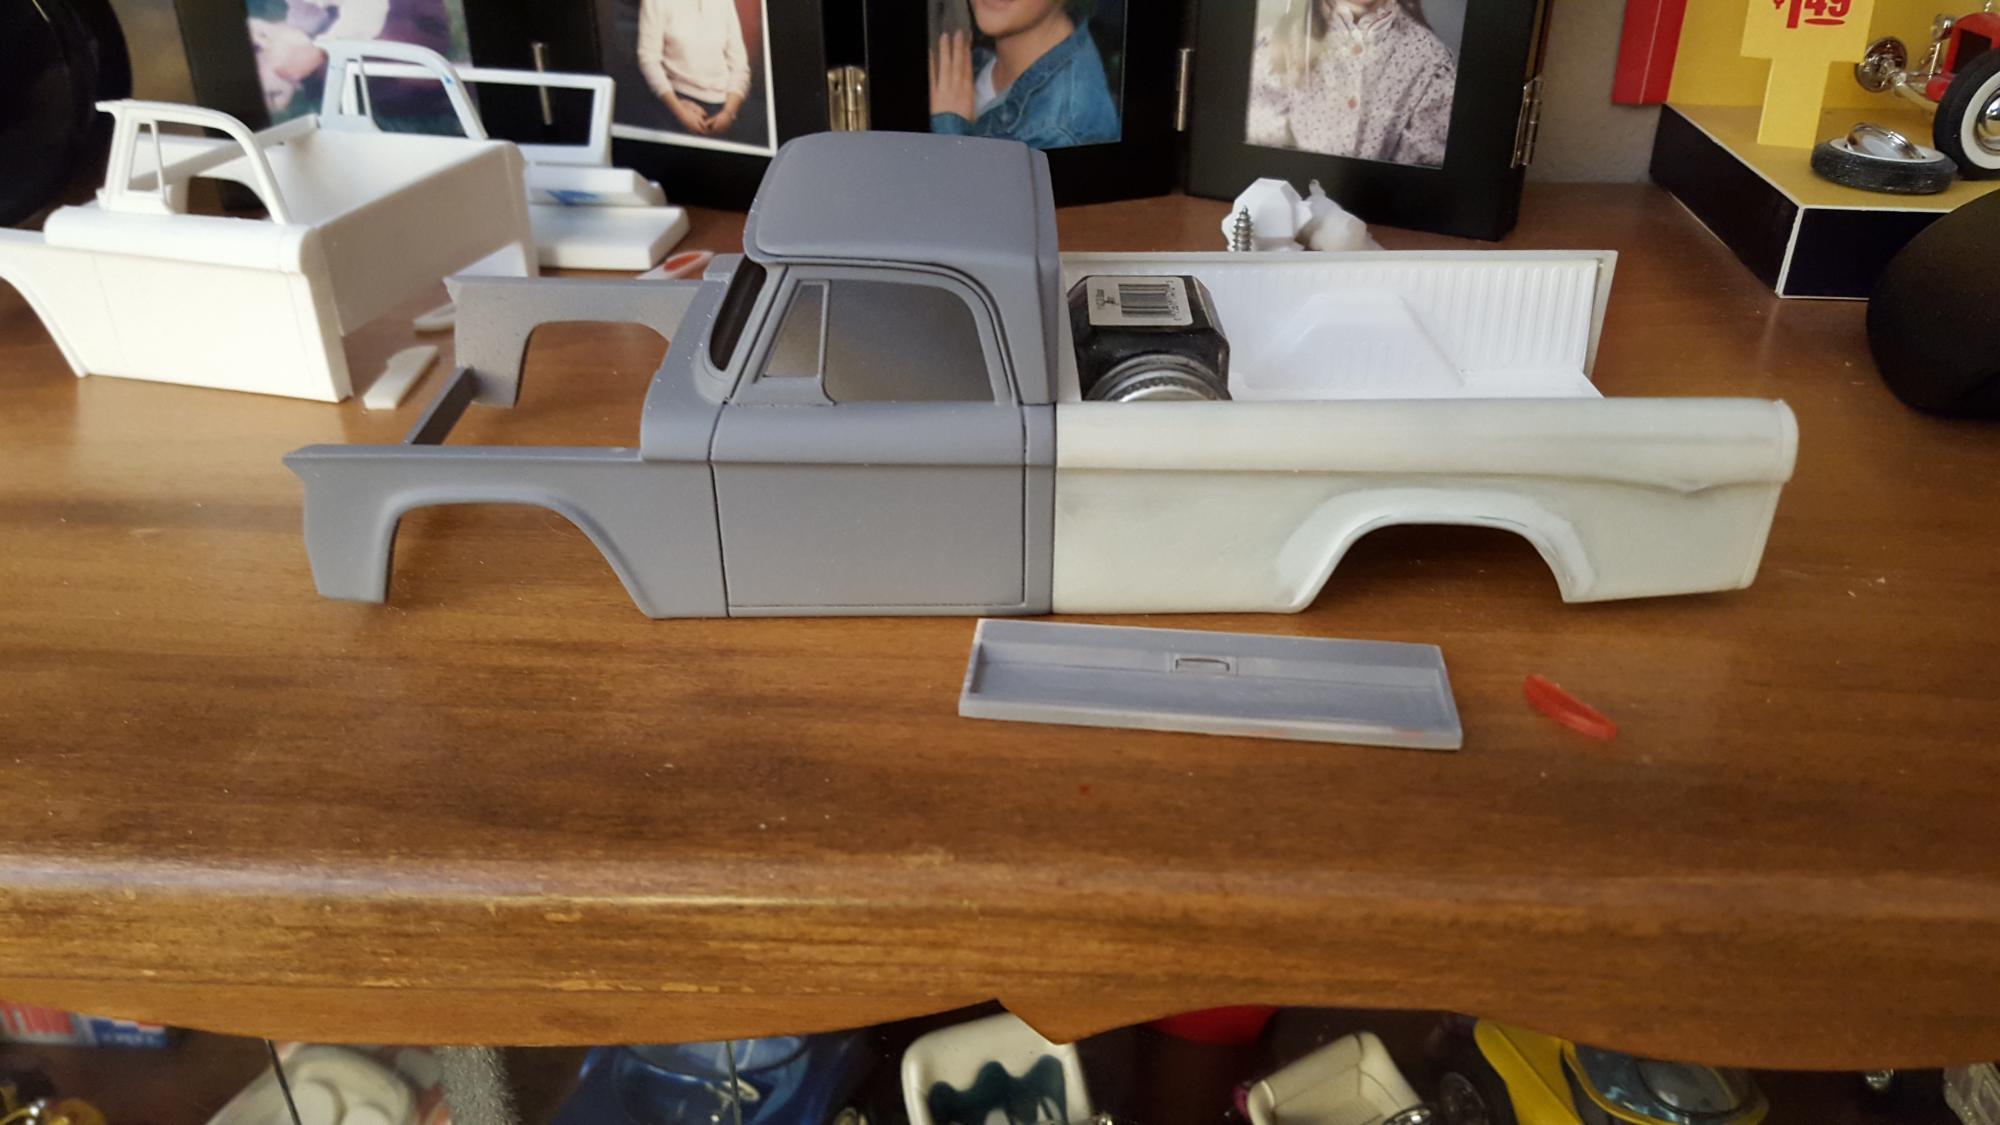 1970 dodge truck 3d print - On the Workbench: Pickups, Vans, SUVs